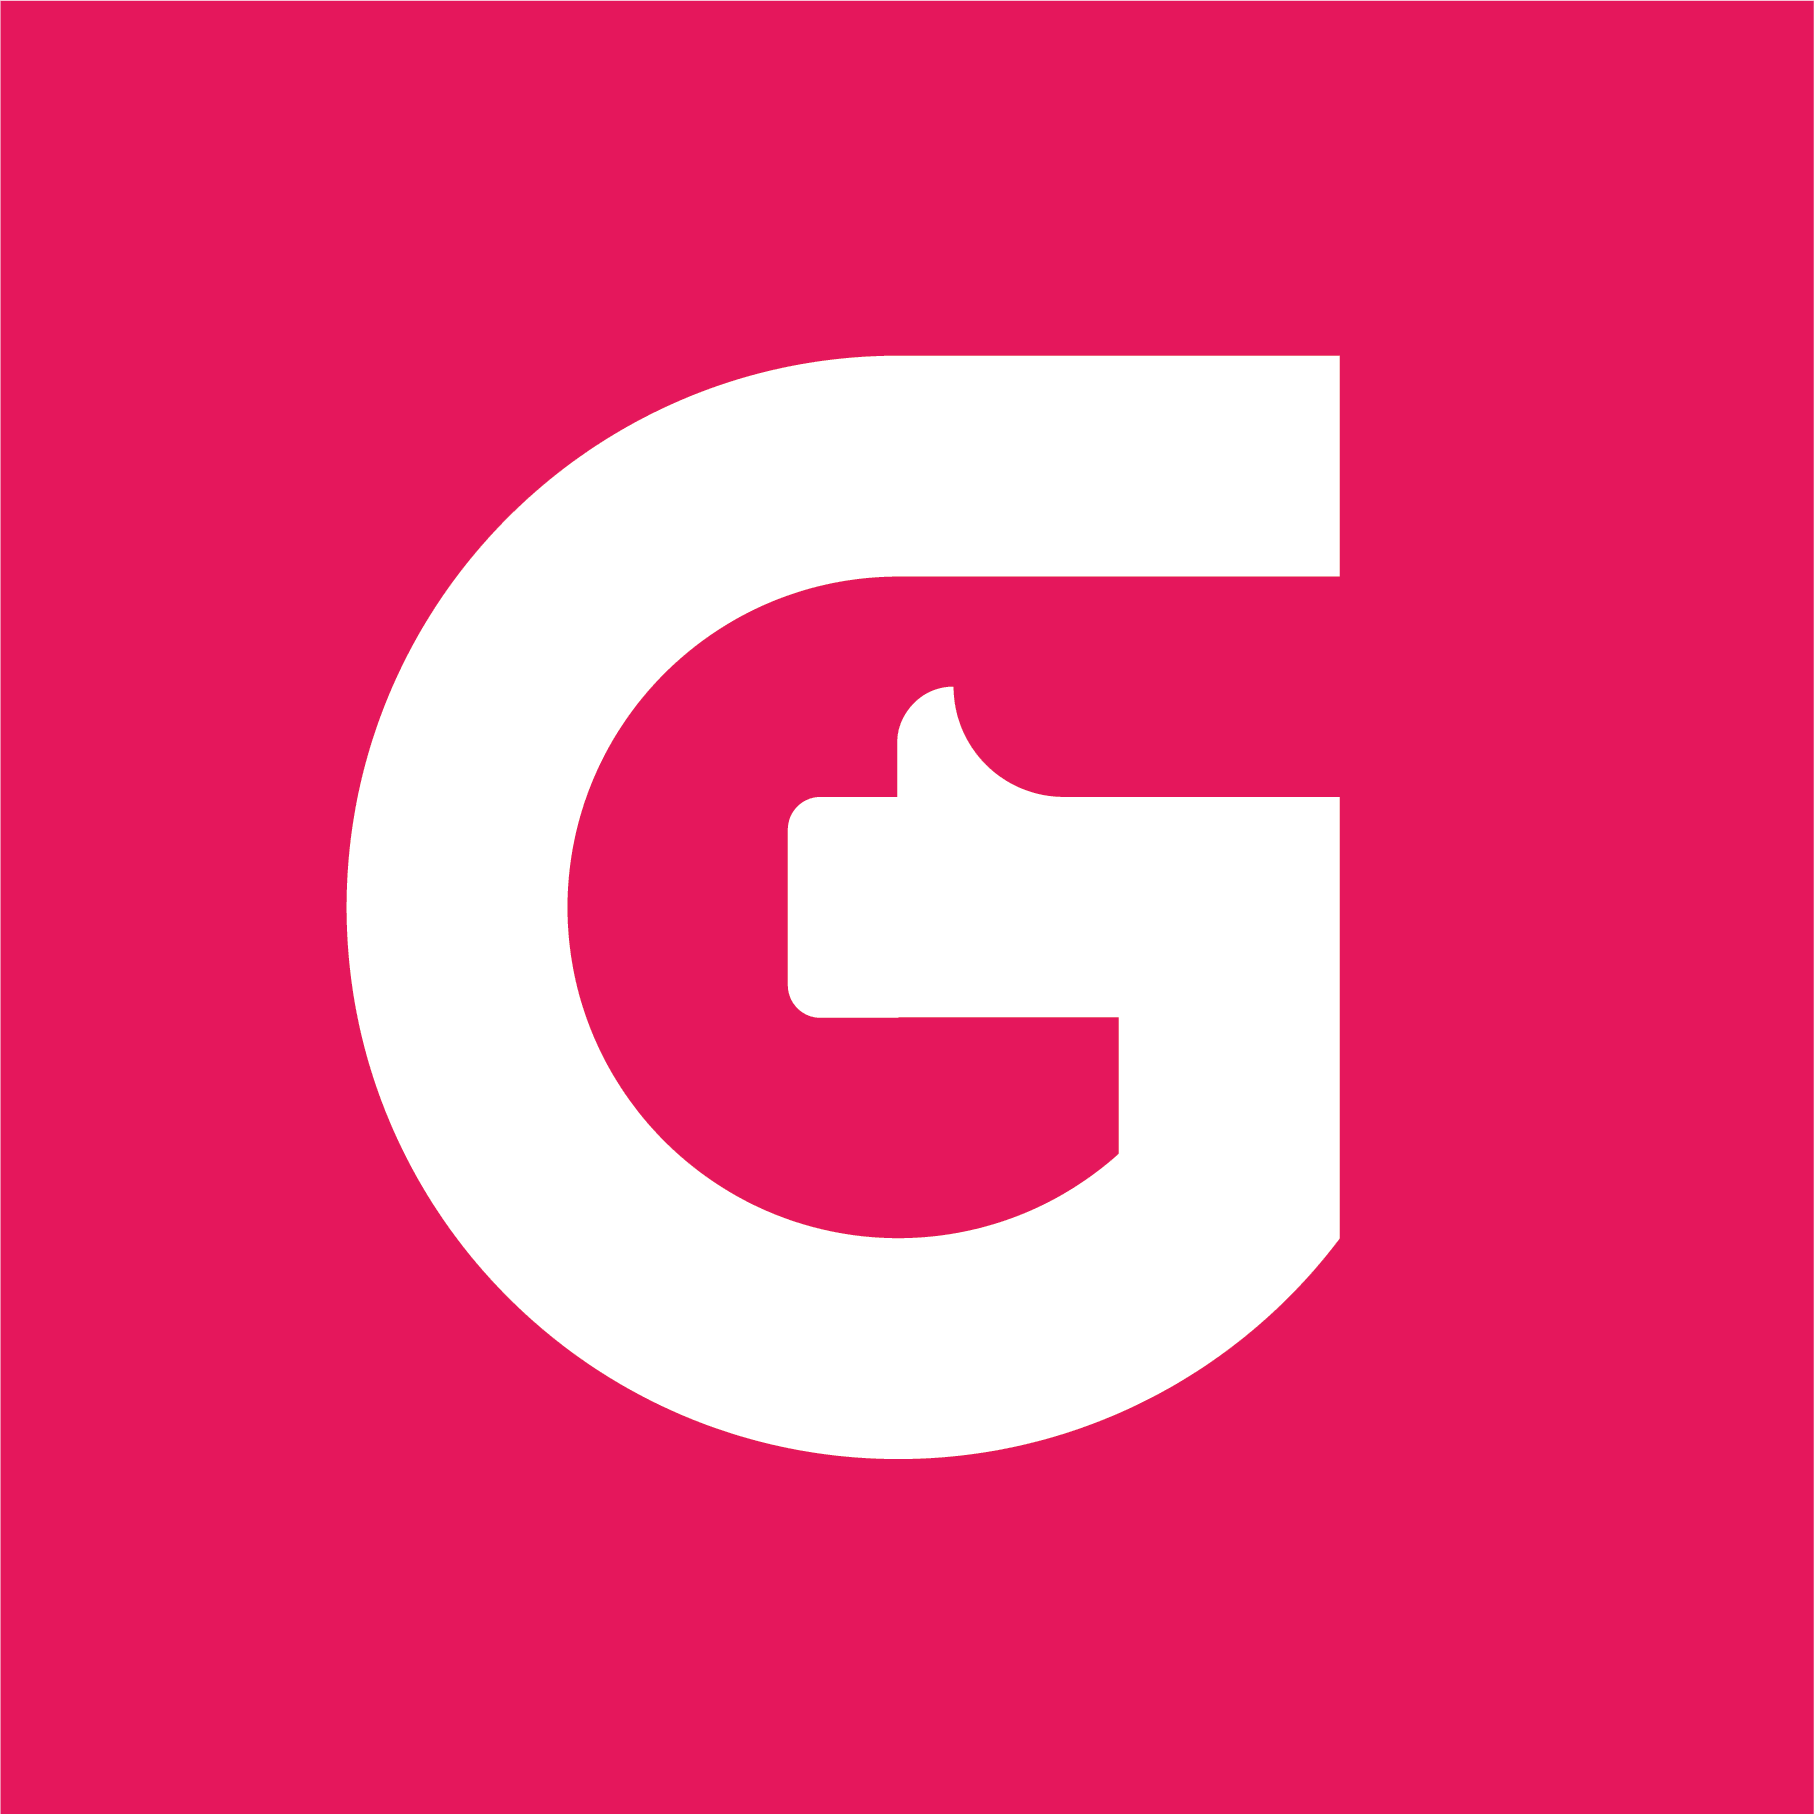 Logo Gubjob